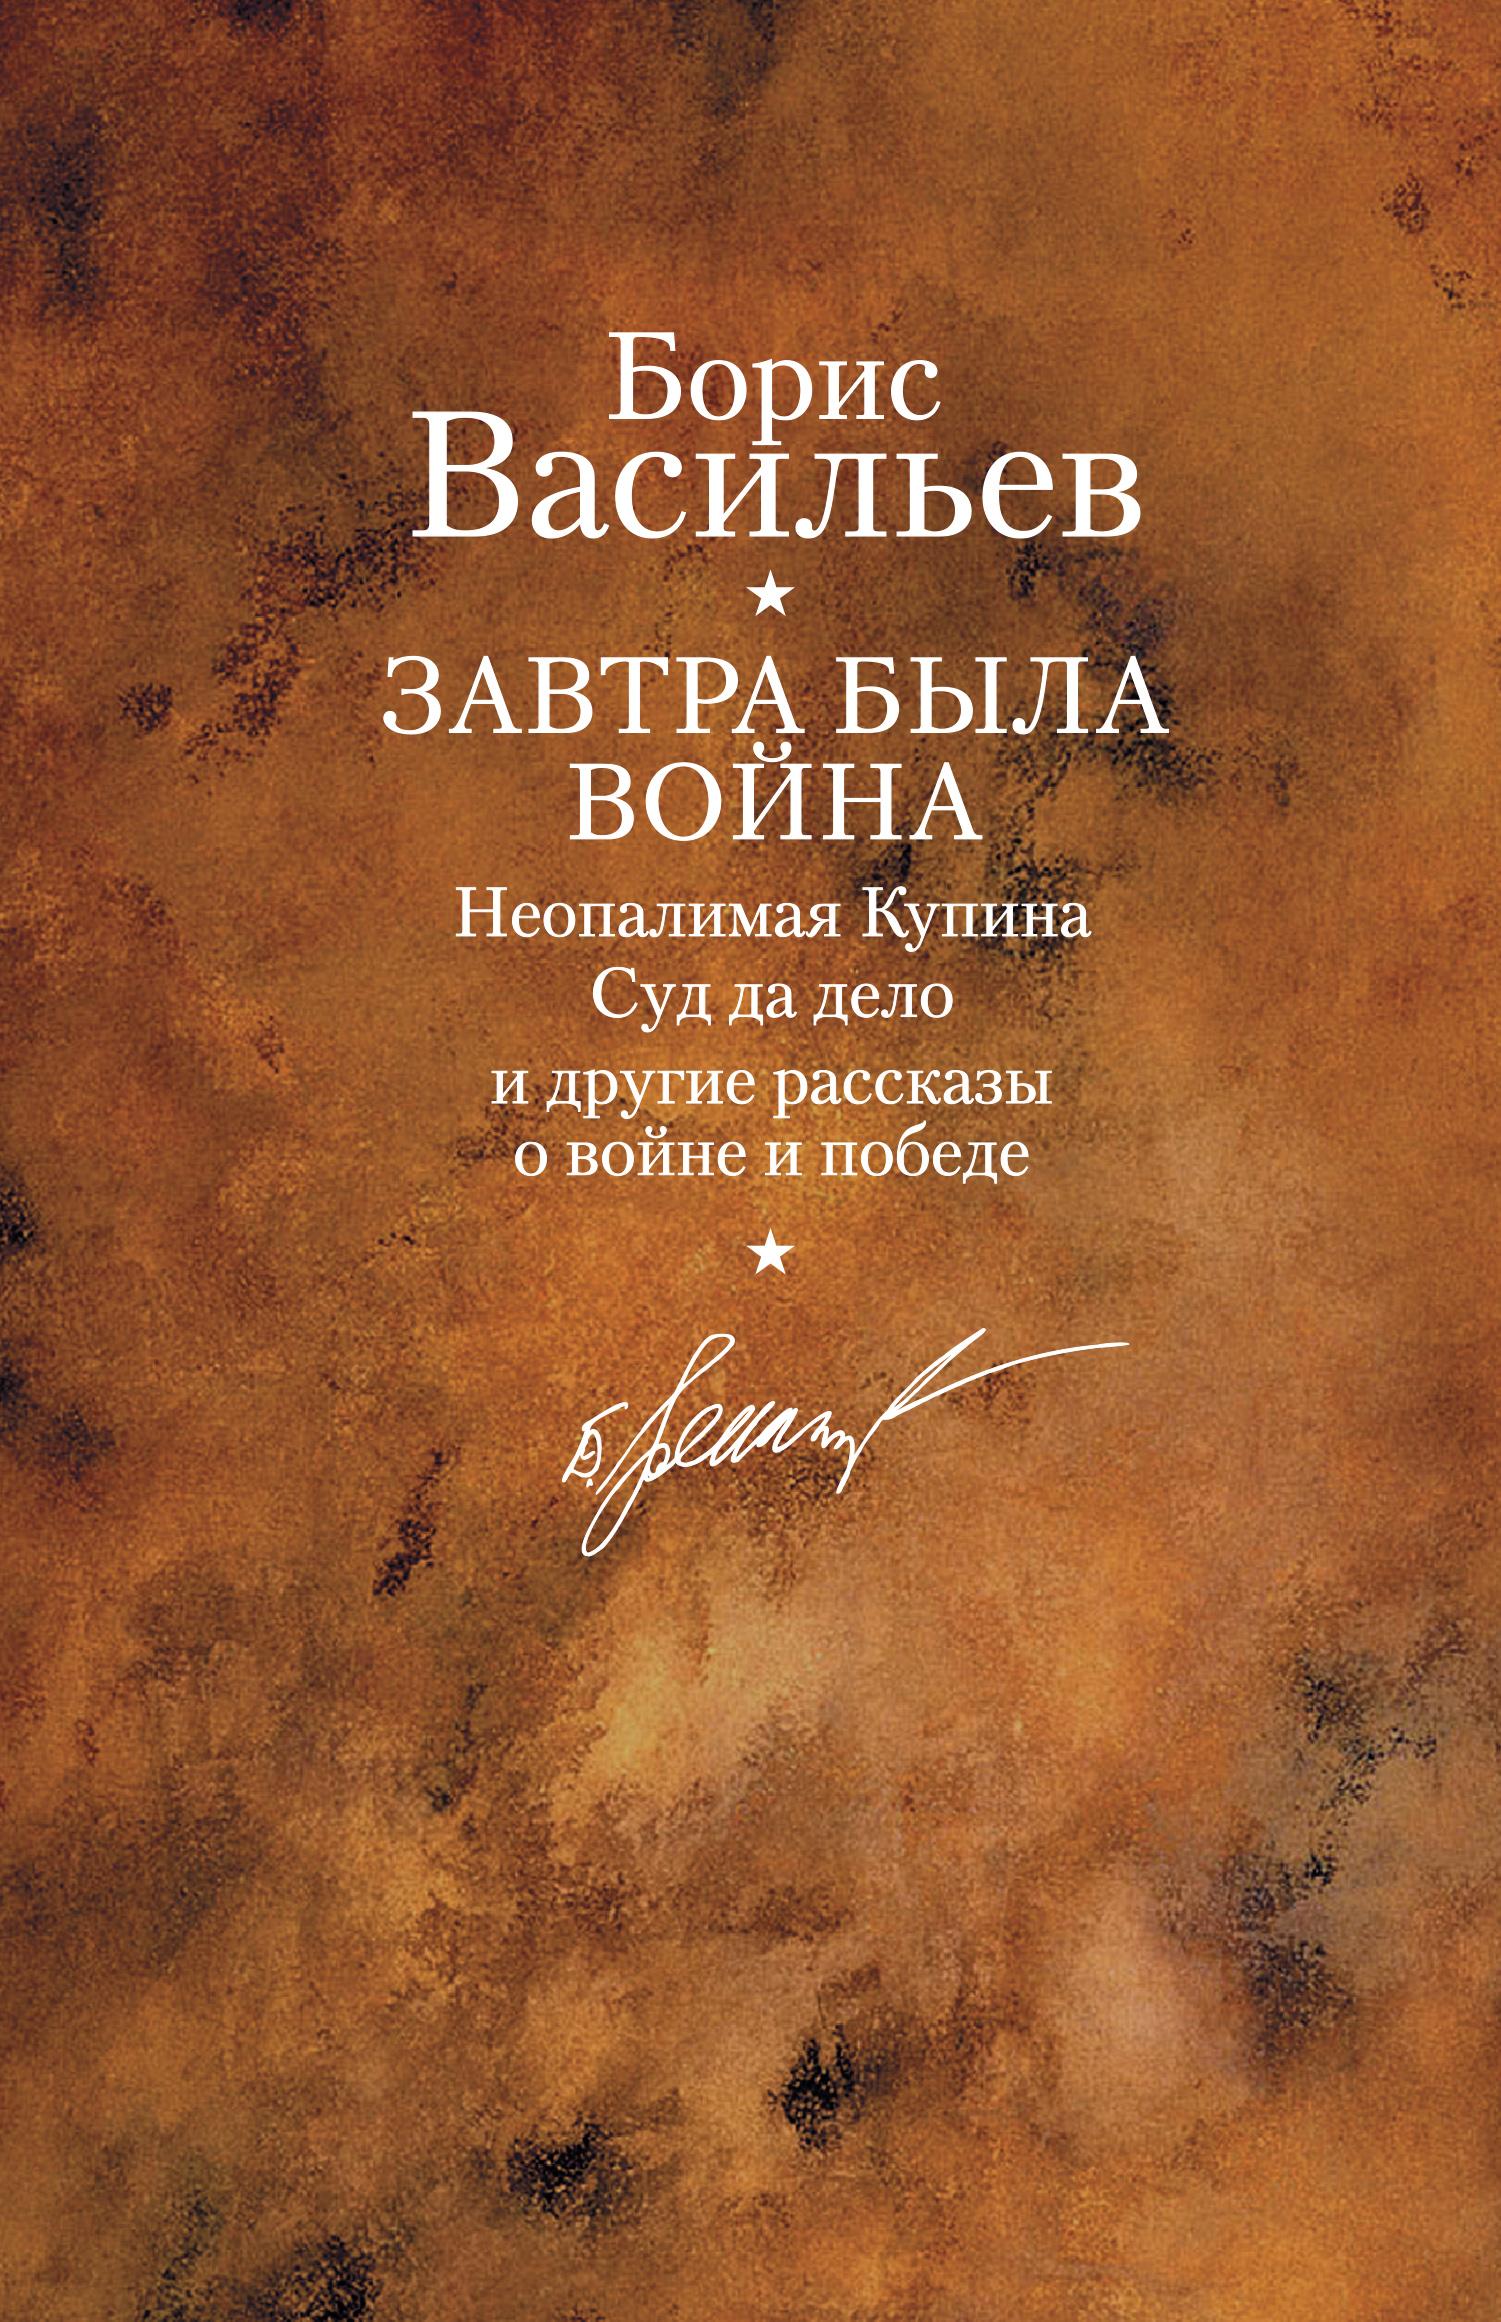 Борис Васильев Ветеран борис васильев ветеран